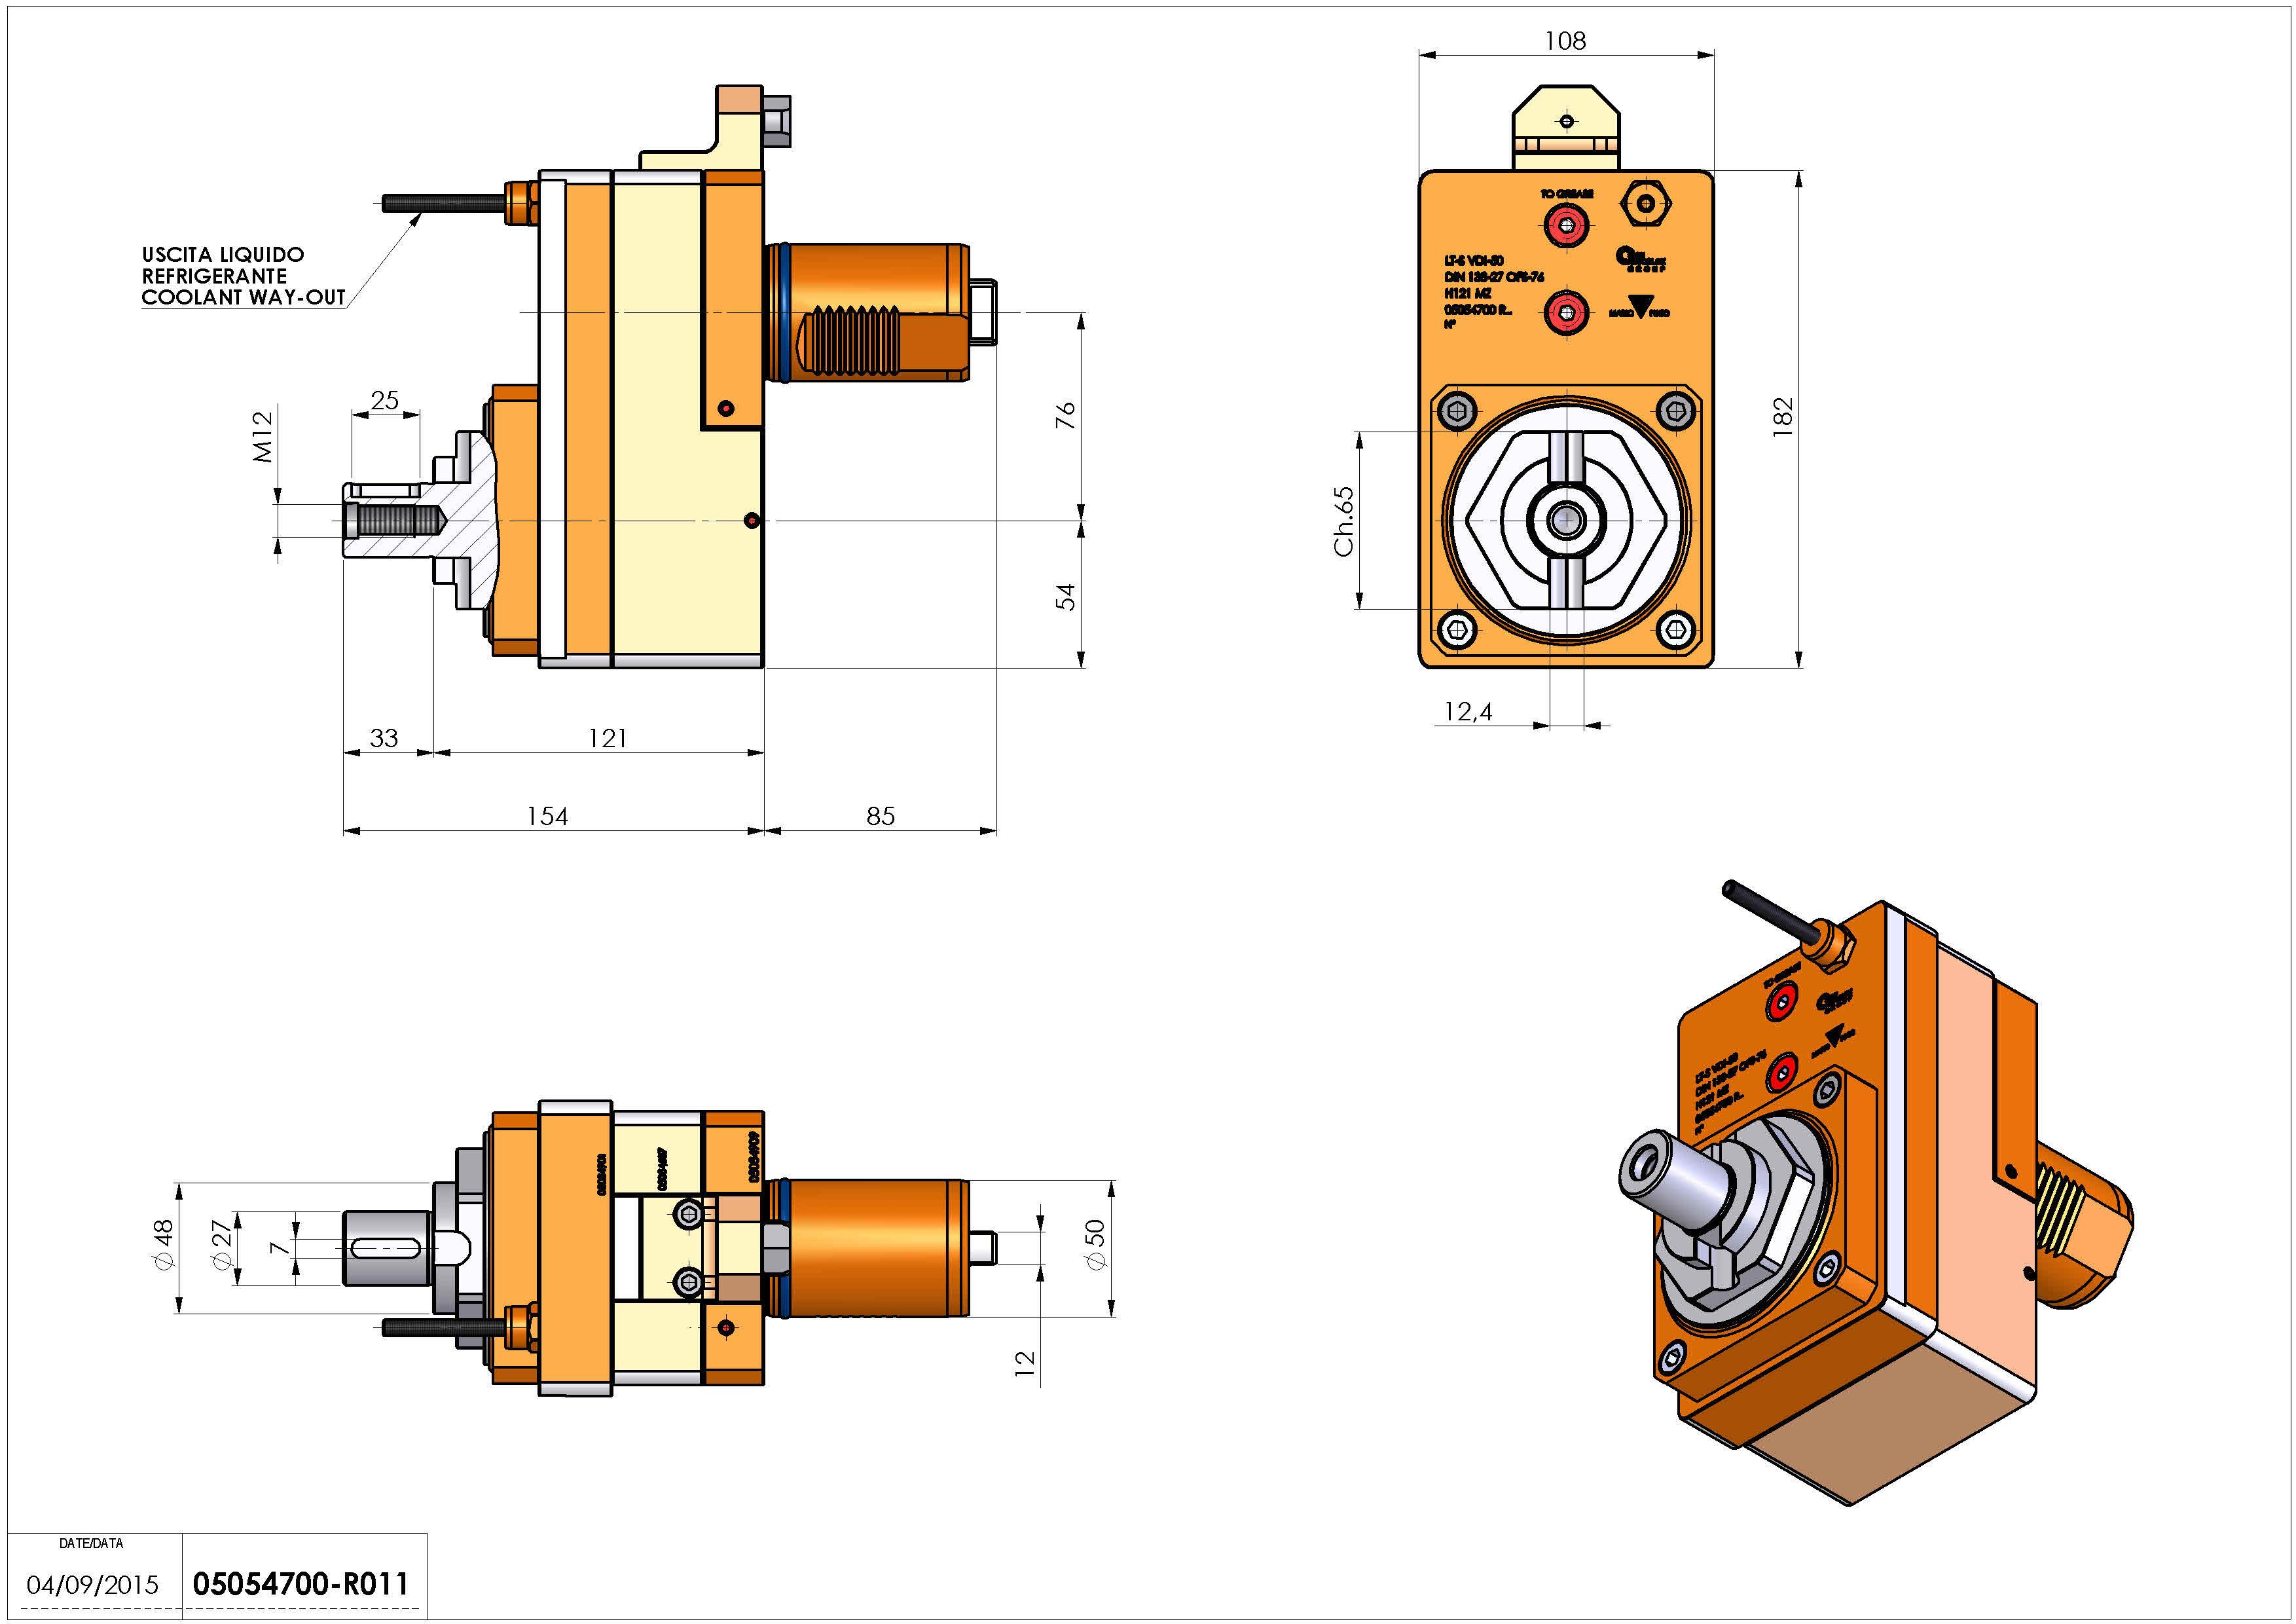 Technical image - LT-S VDI50 DIN27 OFS76 H121 MZ.